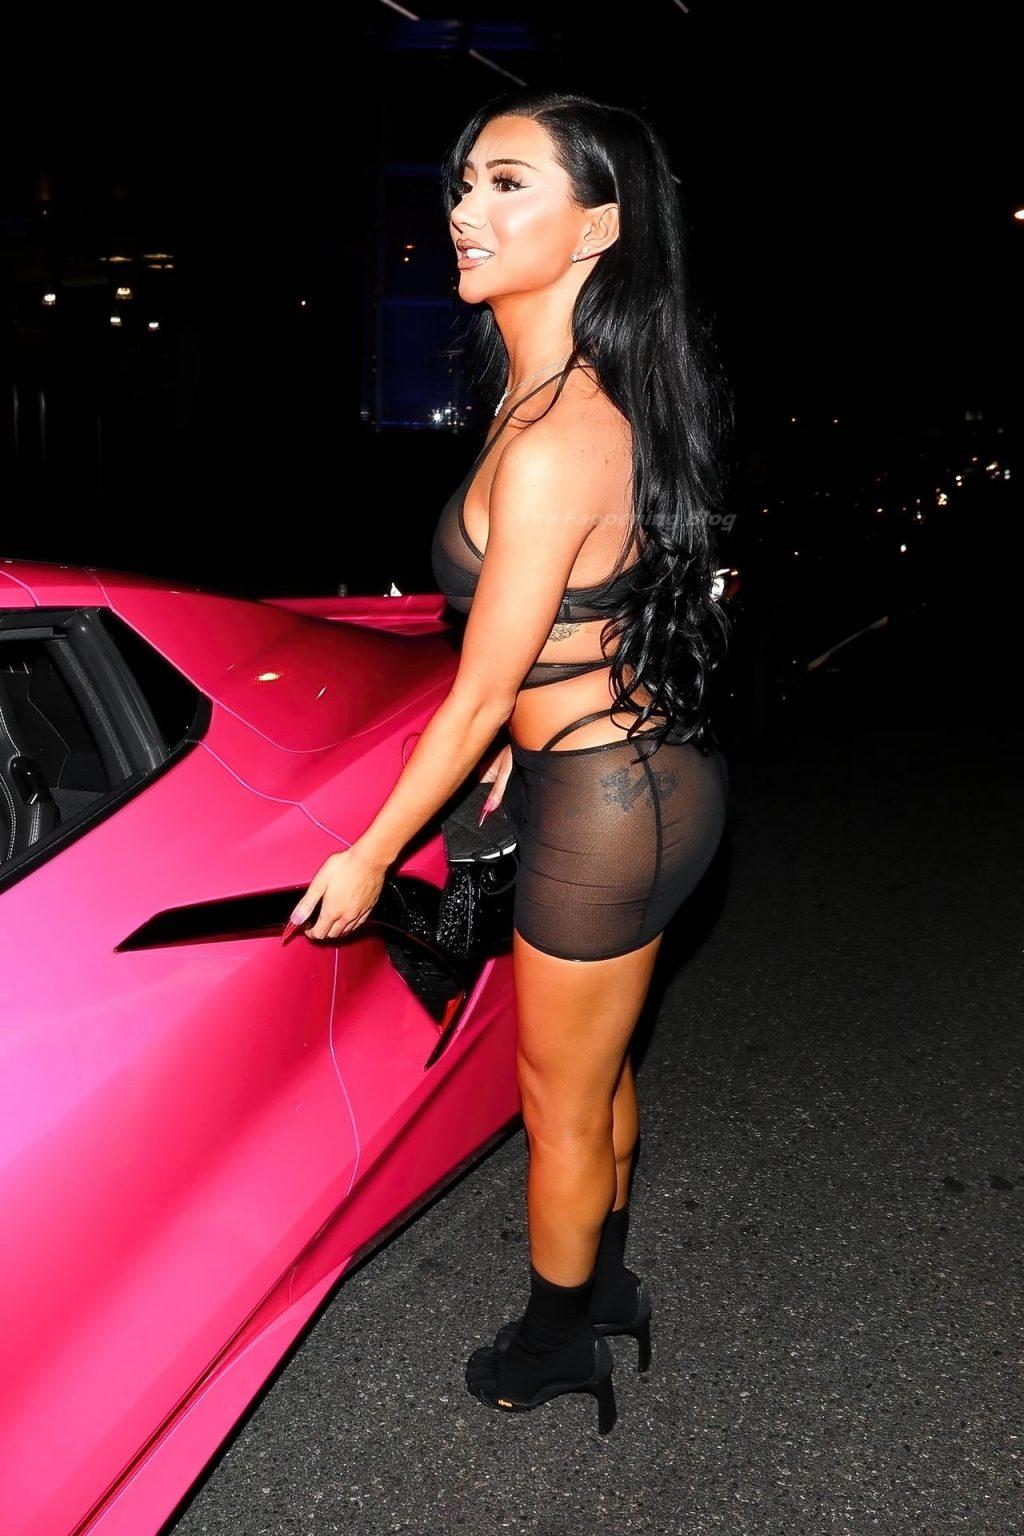 Nikita Dragun Shows Off Her Nude Boobs While Celebrating Her Birthday in LA (16 Photos)